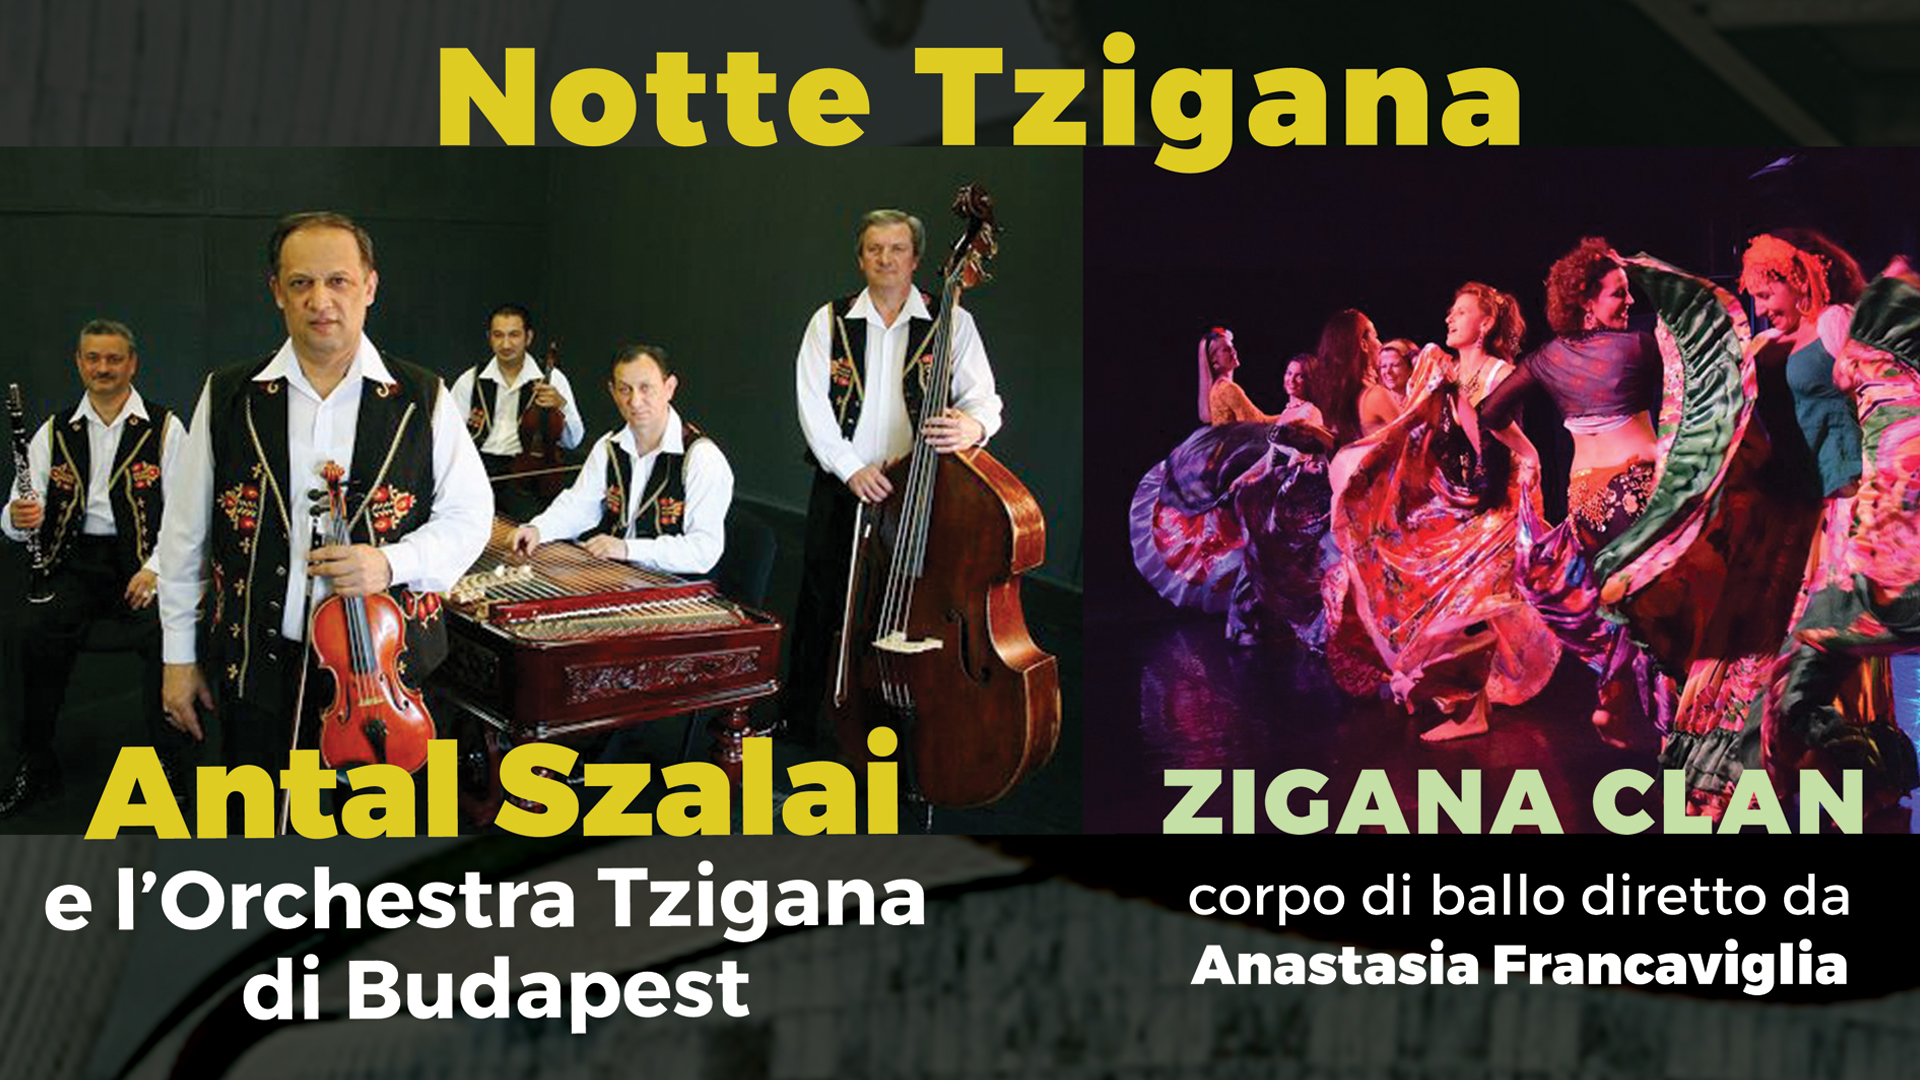 17.11.17 • Antal Szalai & Orchestra Tzigana di Budapest • Auditorium Parco della Musica